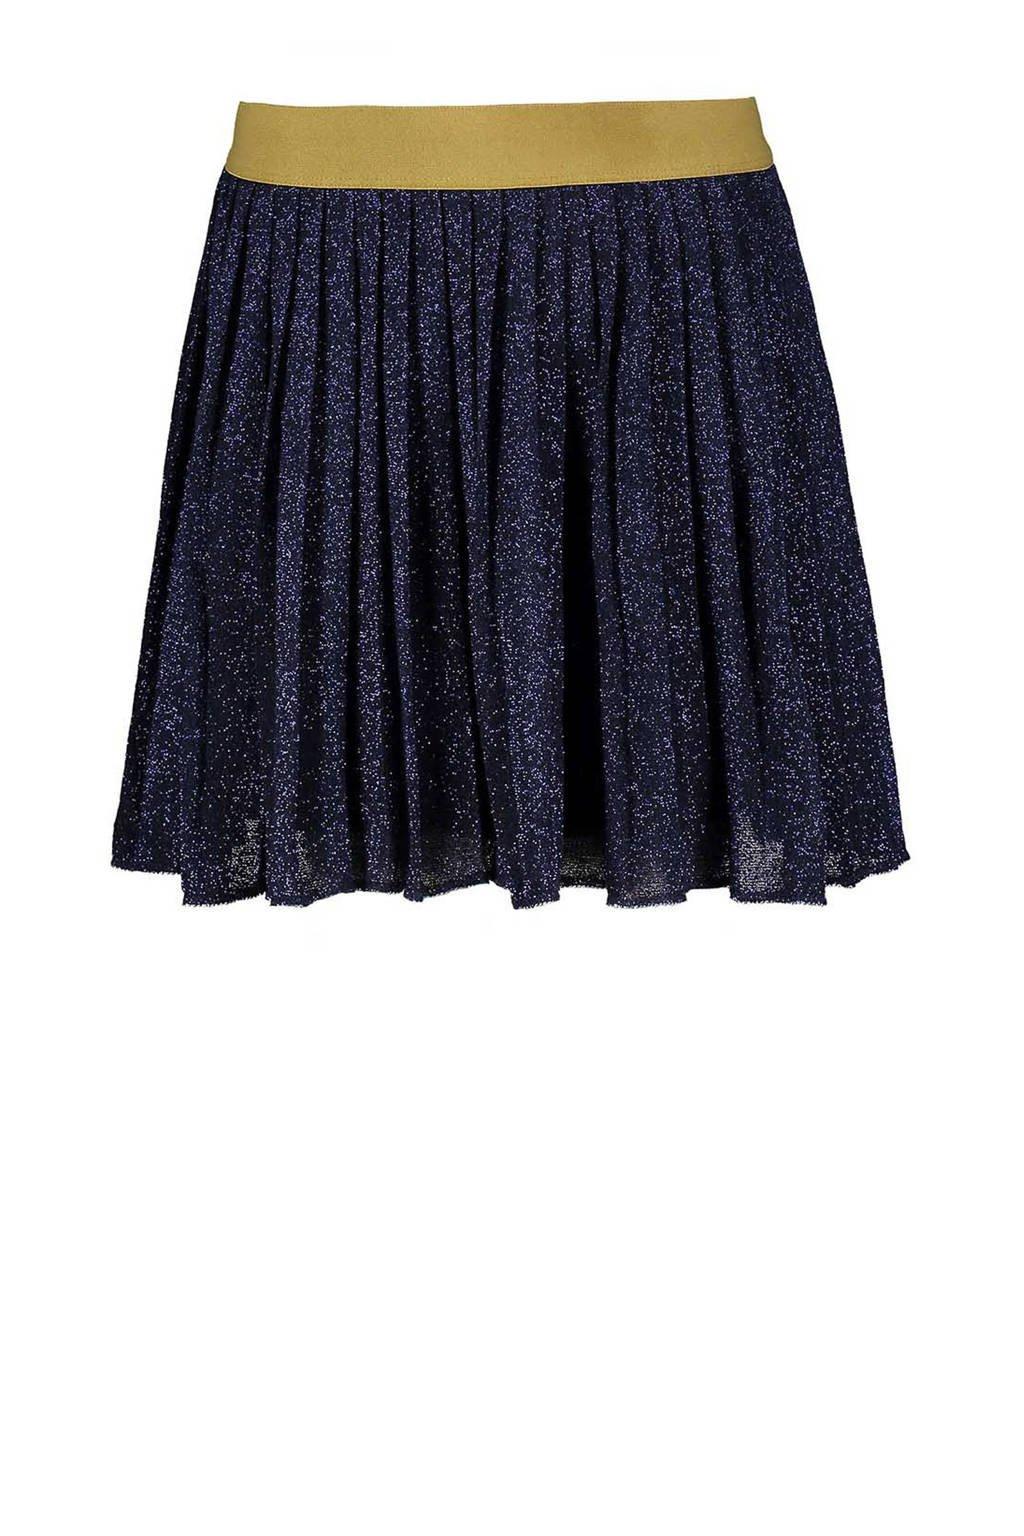 Sissy-Boy plissé rok met glitters donkerblauw, Donkerblauw